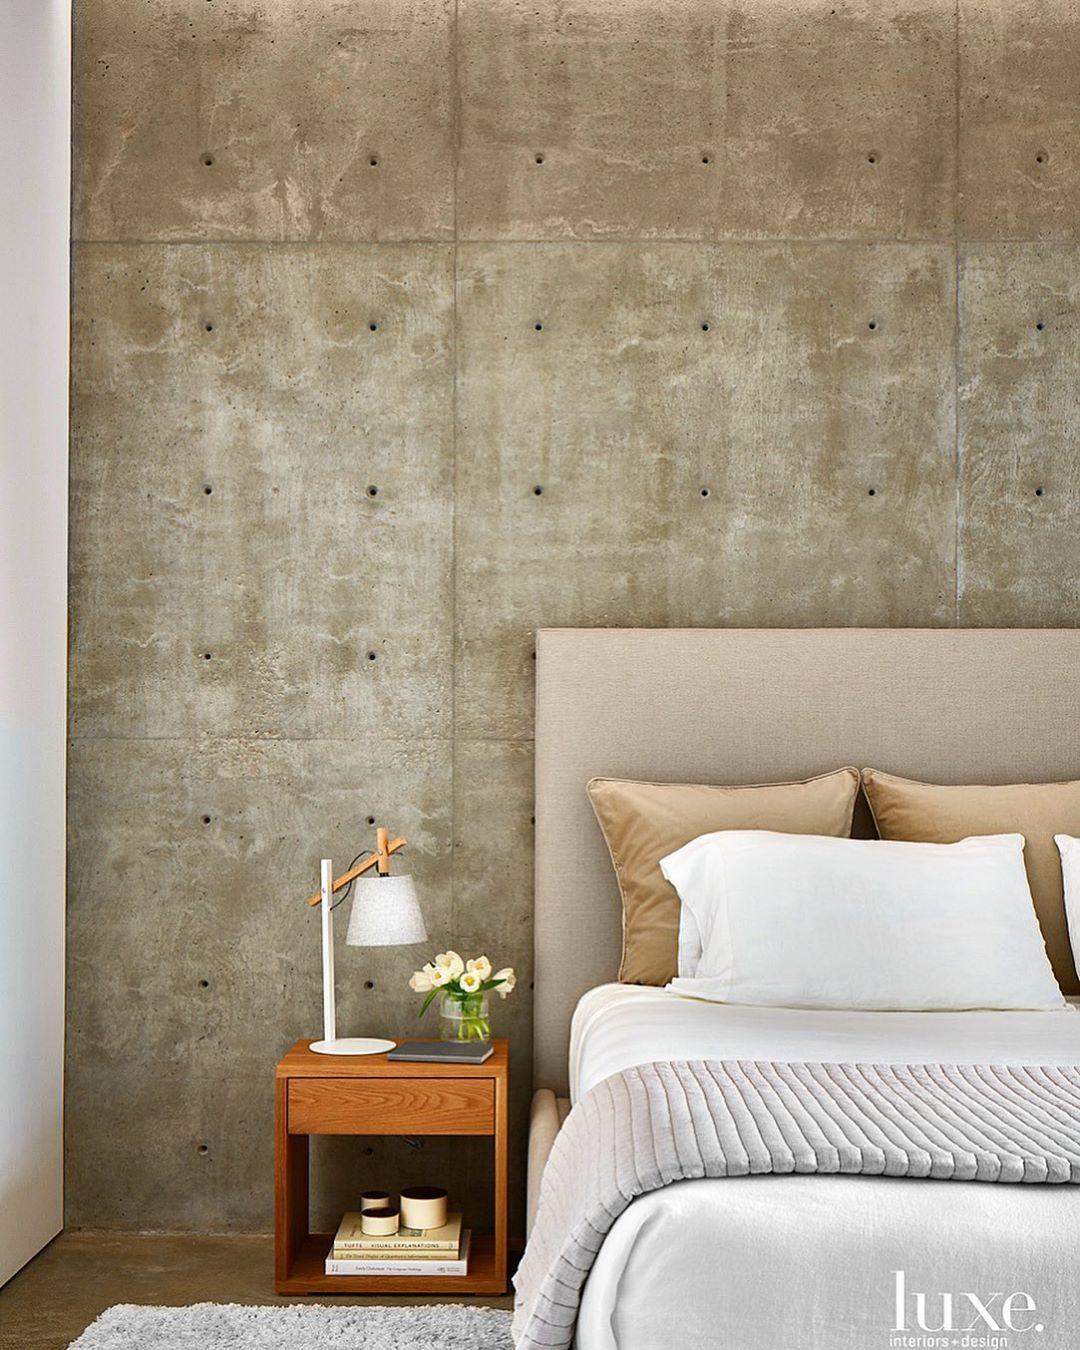 Luxe Interiors Design On Instagram Going Industrial With Concrete Walls Luxeathome Sandow Photo Drorbaldin In 2020 Interior Design Luxe Interiors Furniture